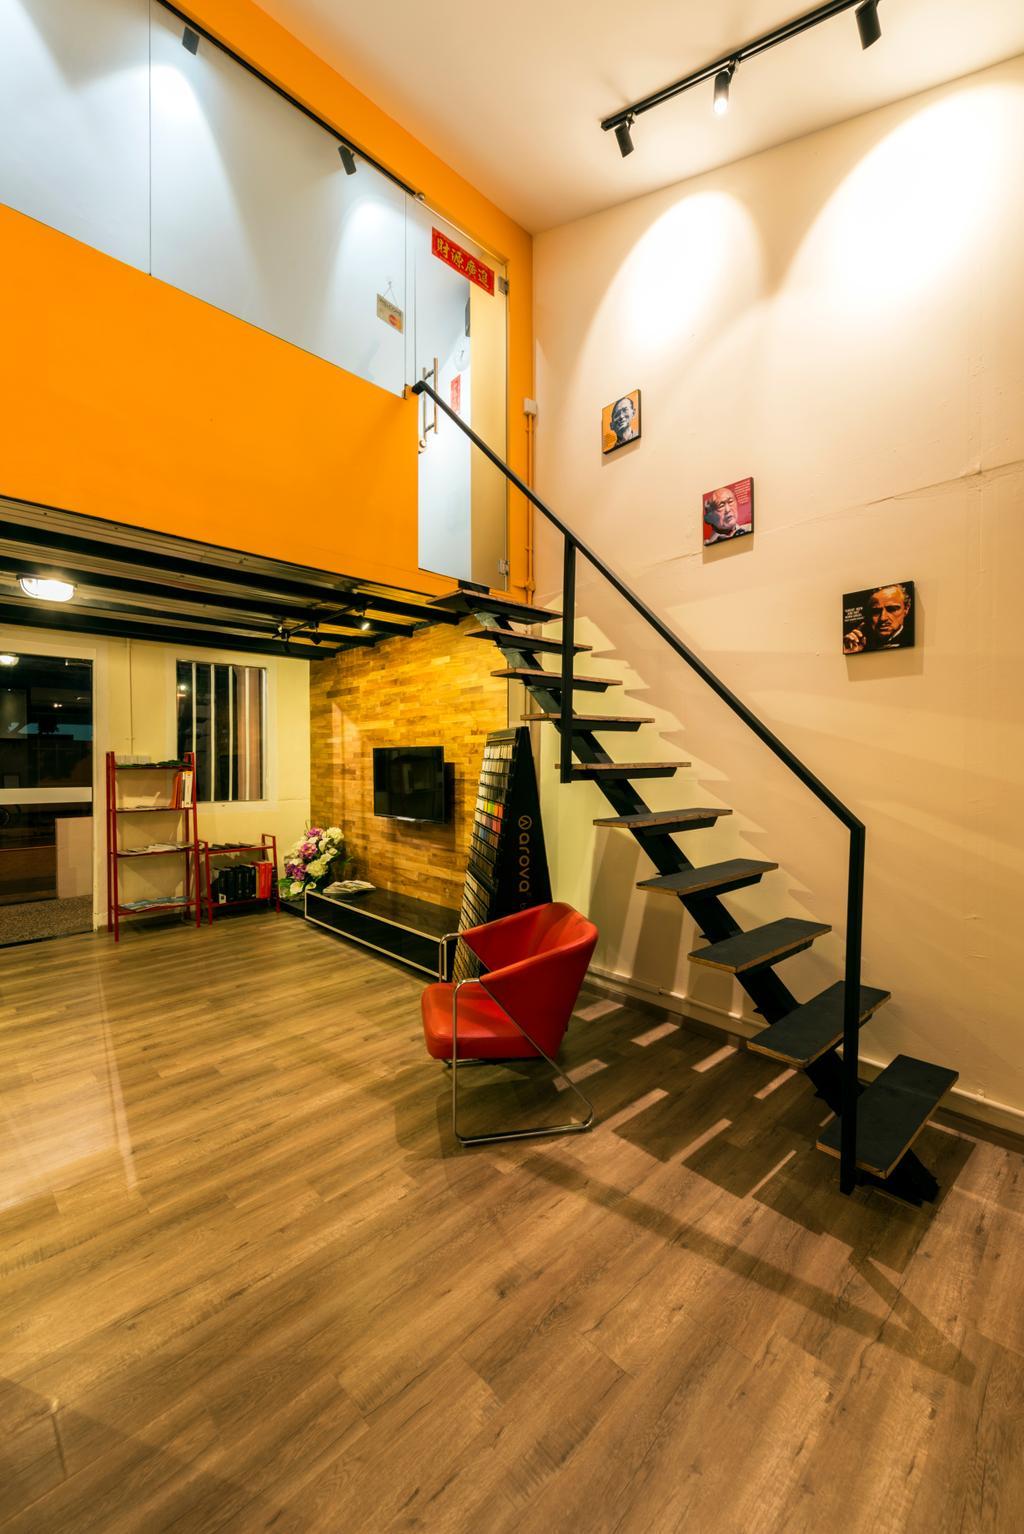 Chiku, Commercial, Interior Designer, Tan Studio, Industrial, Chair, Furniture, Banister, Handrail, Staircase, Indoors, Interior Design